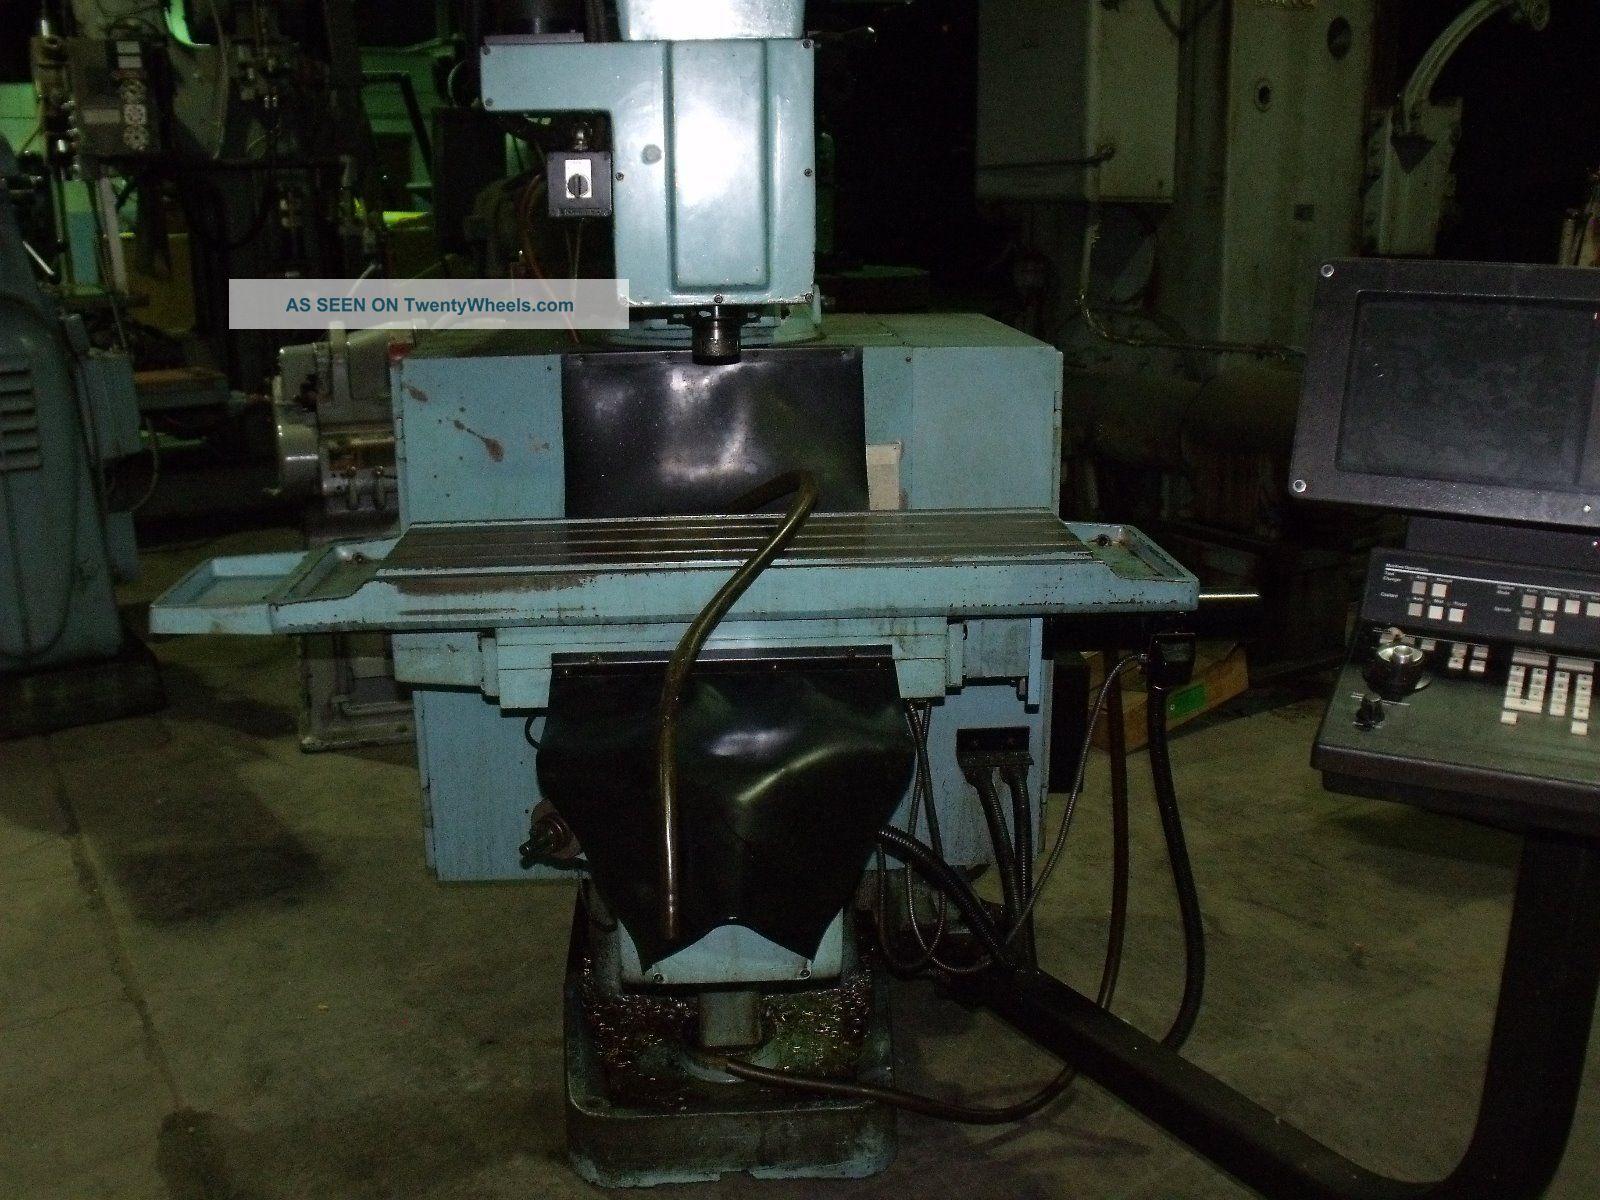 Hurco Cnc Mill Model Km - 3p S/n Kdb8013059e Milling Machines photo